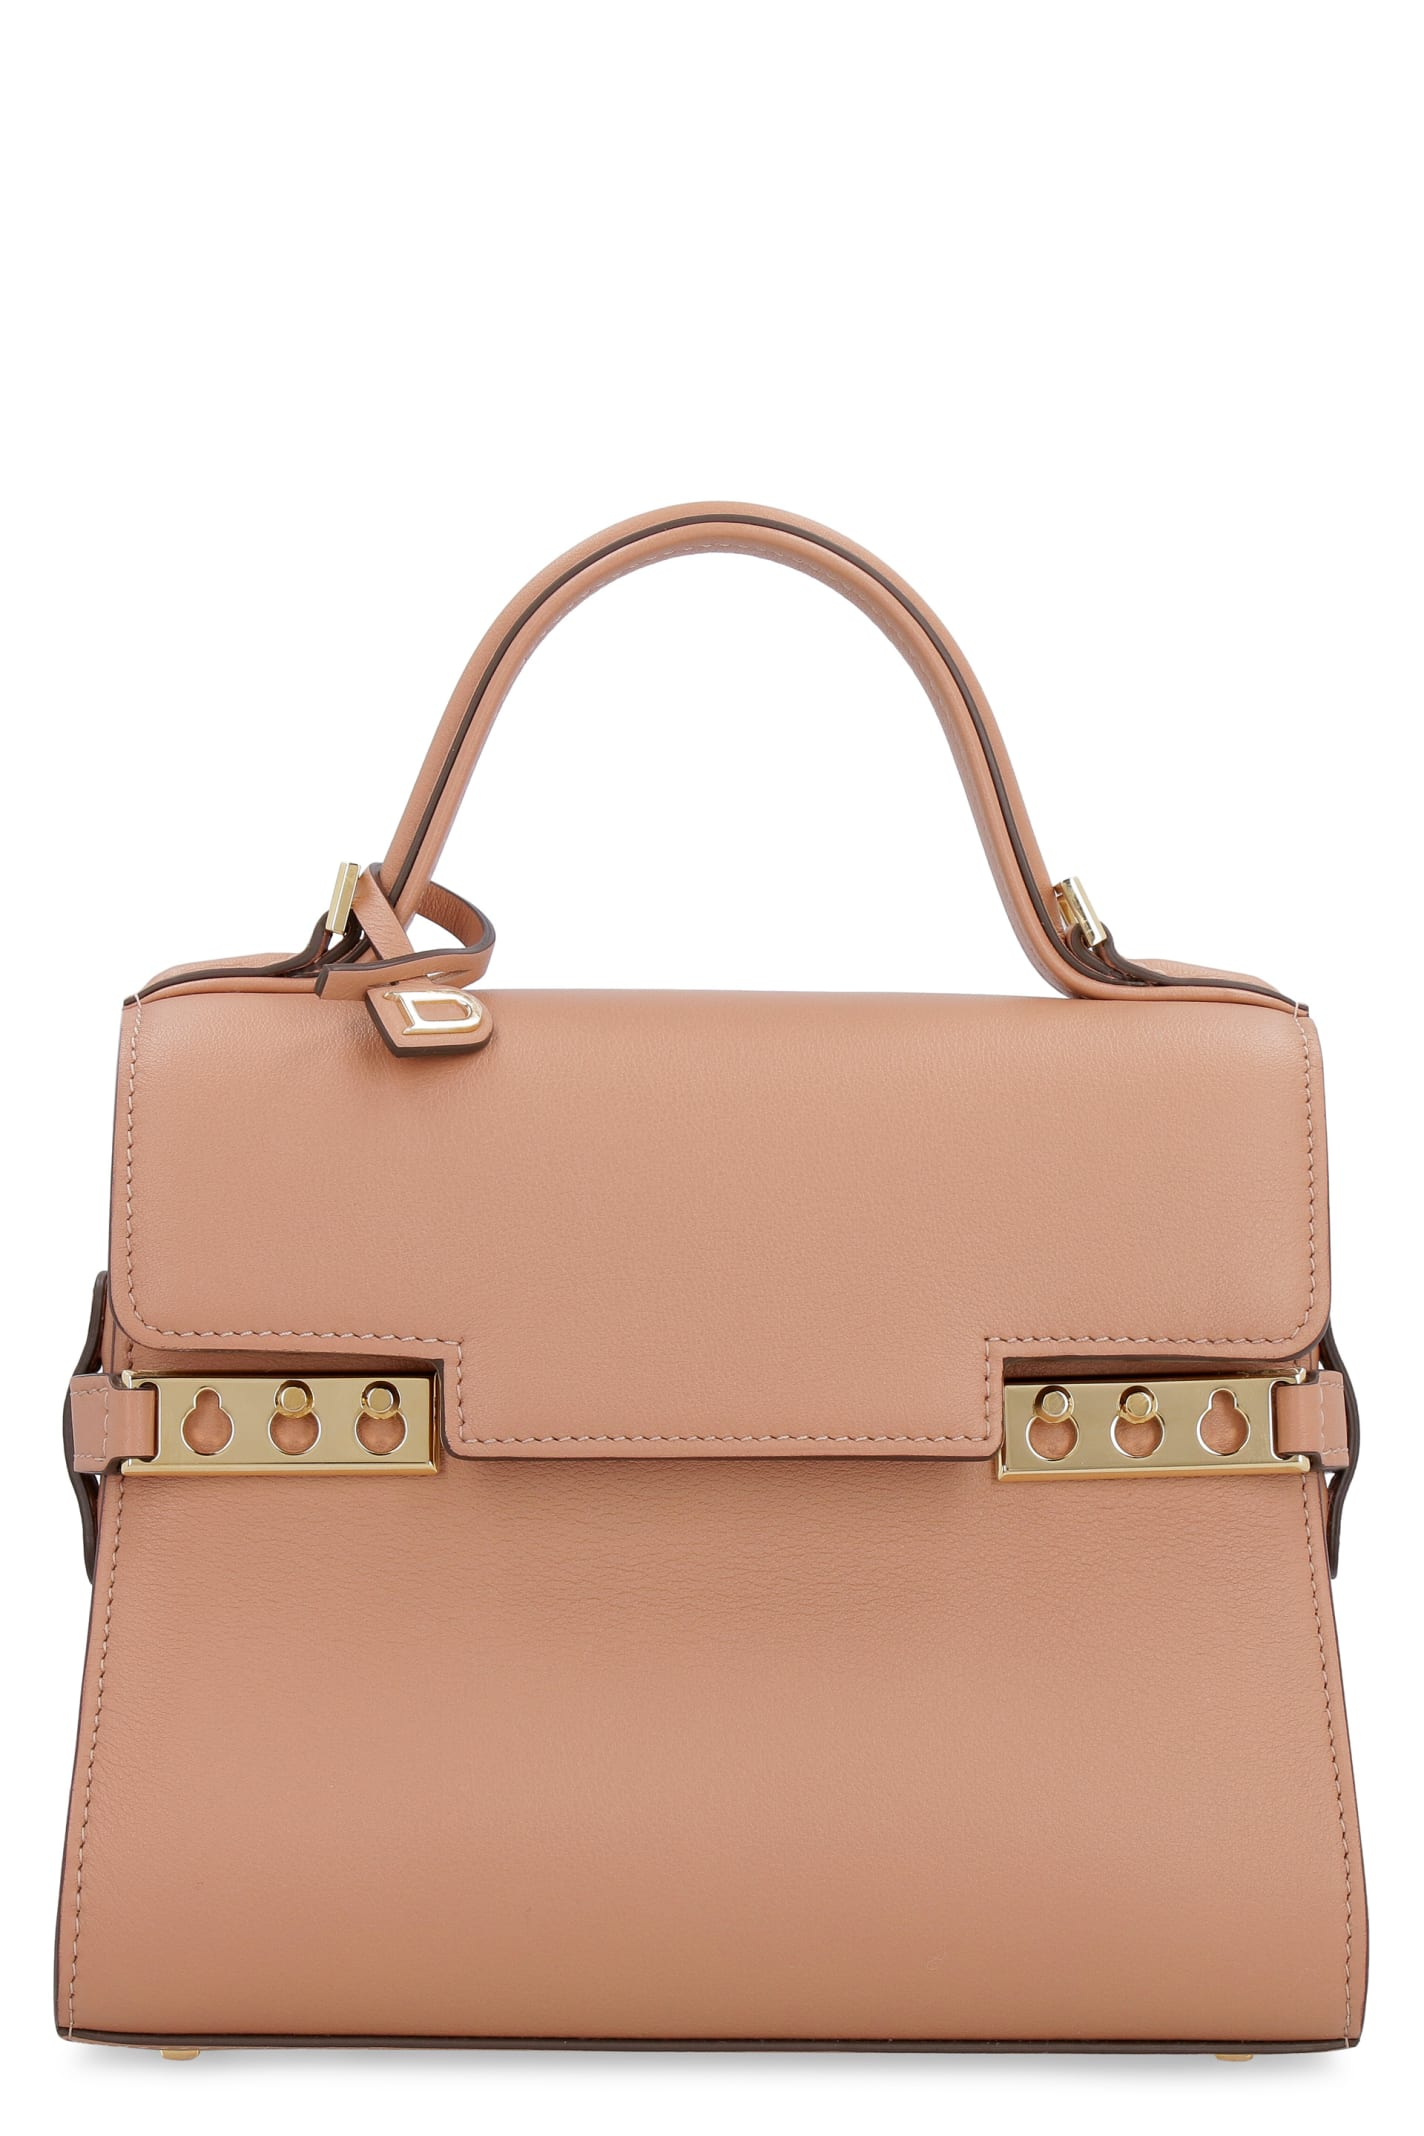 Tempête Small Leather Bag